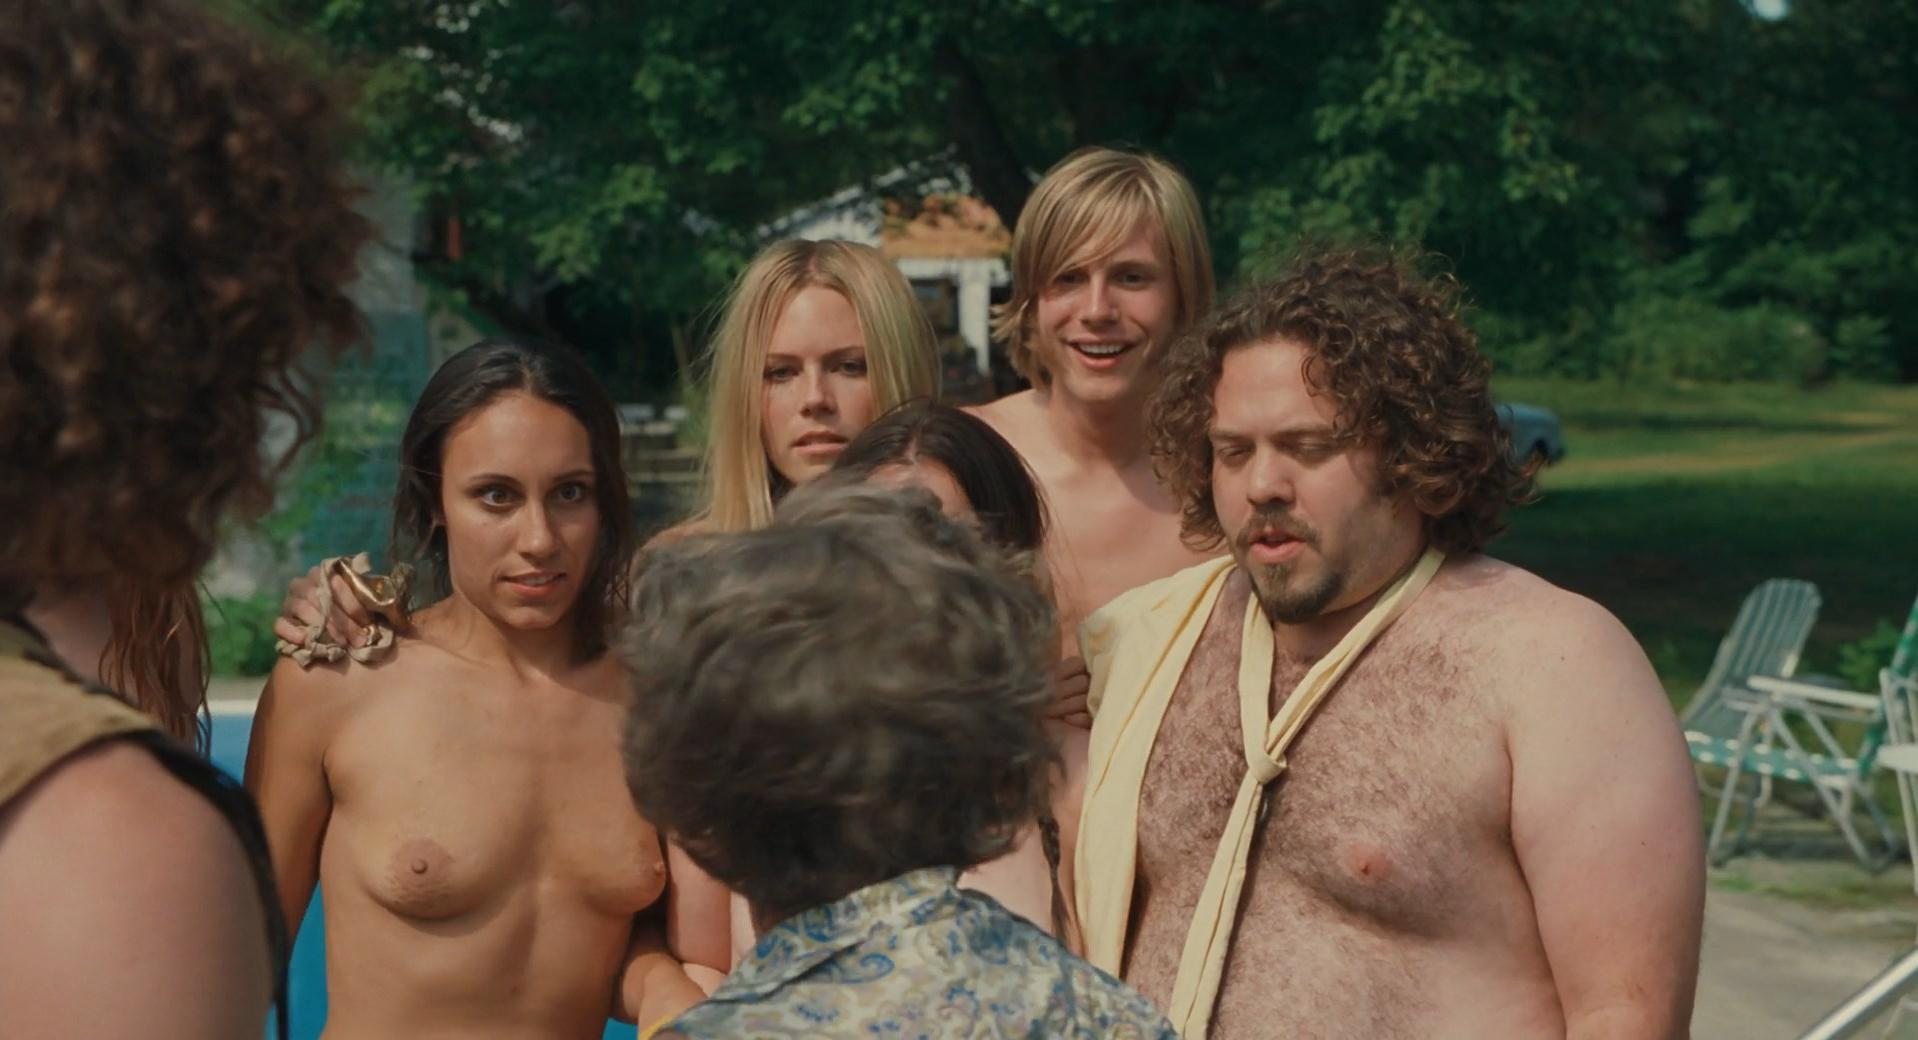 Pity, Kelli garner topless excellent idea